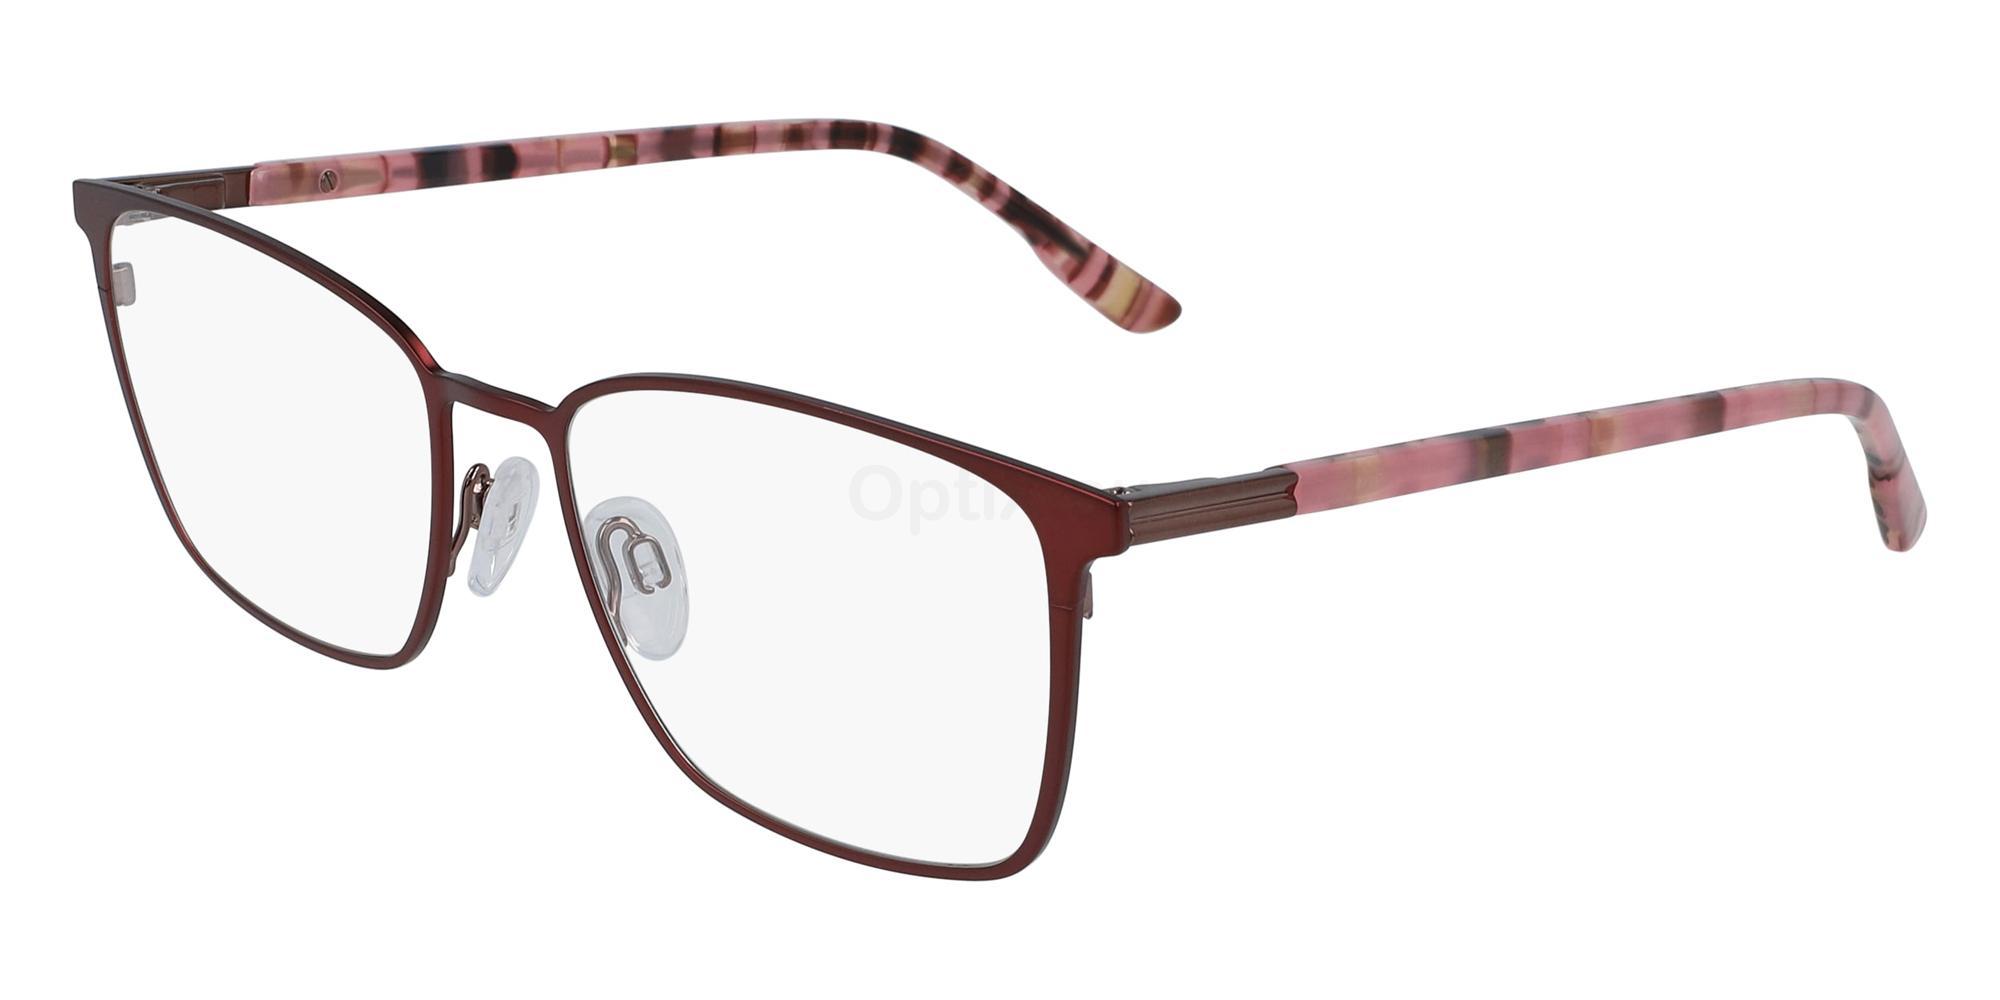 503 SK2100 LILJEKONVALJ Glasses, Skaga